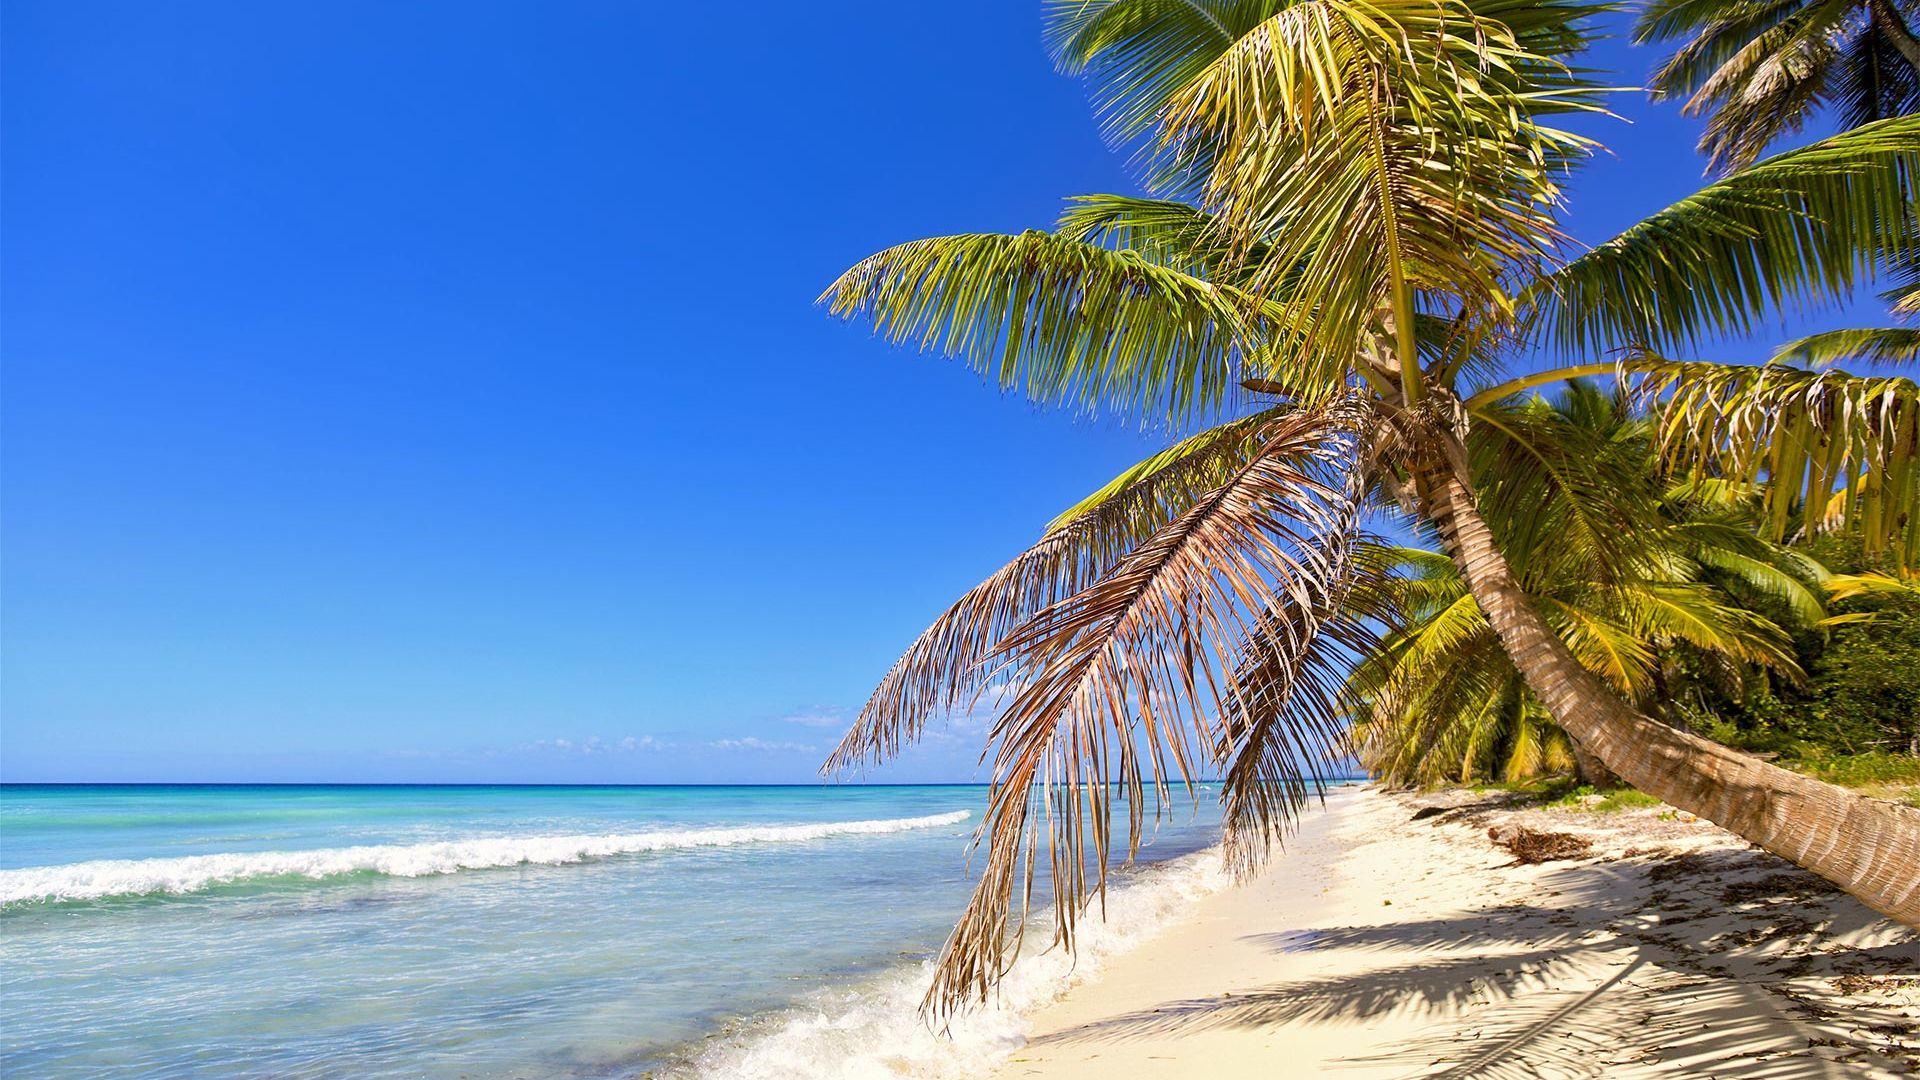 Sejur Plaja Punta Cana, Republica Dominicana, 12 zile - septembrie 2021